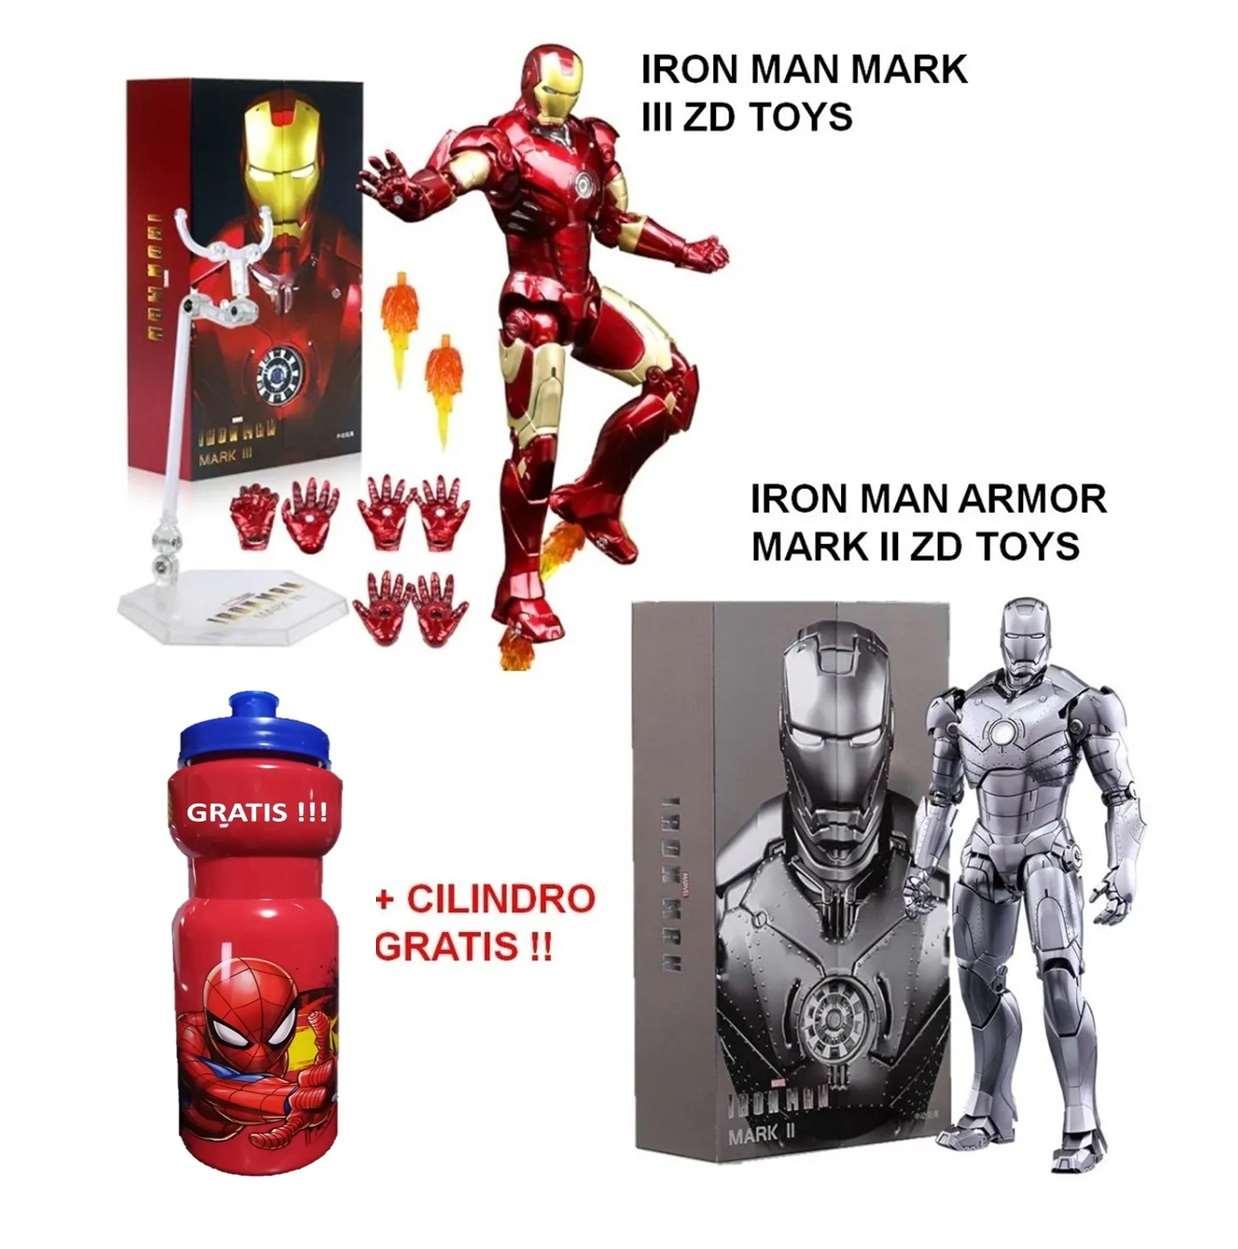 Iron Man Armor Mark Il + Iron Man 3 Mark Ill Zd Toys 6 PuLG